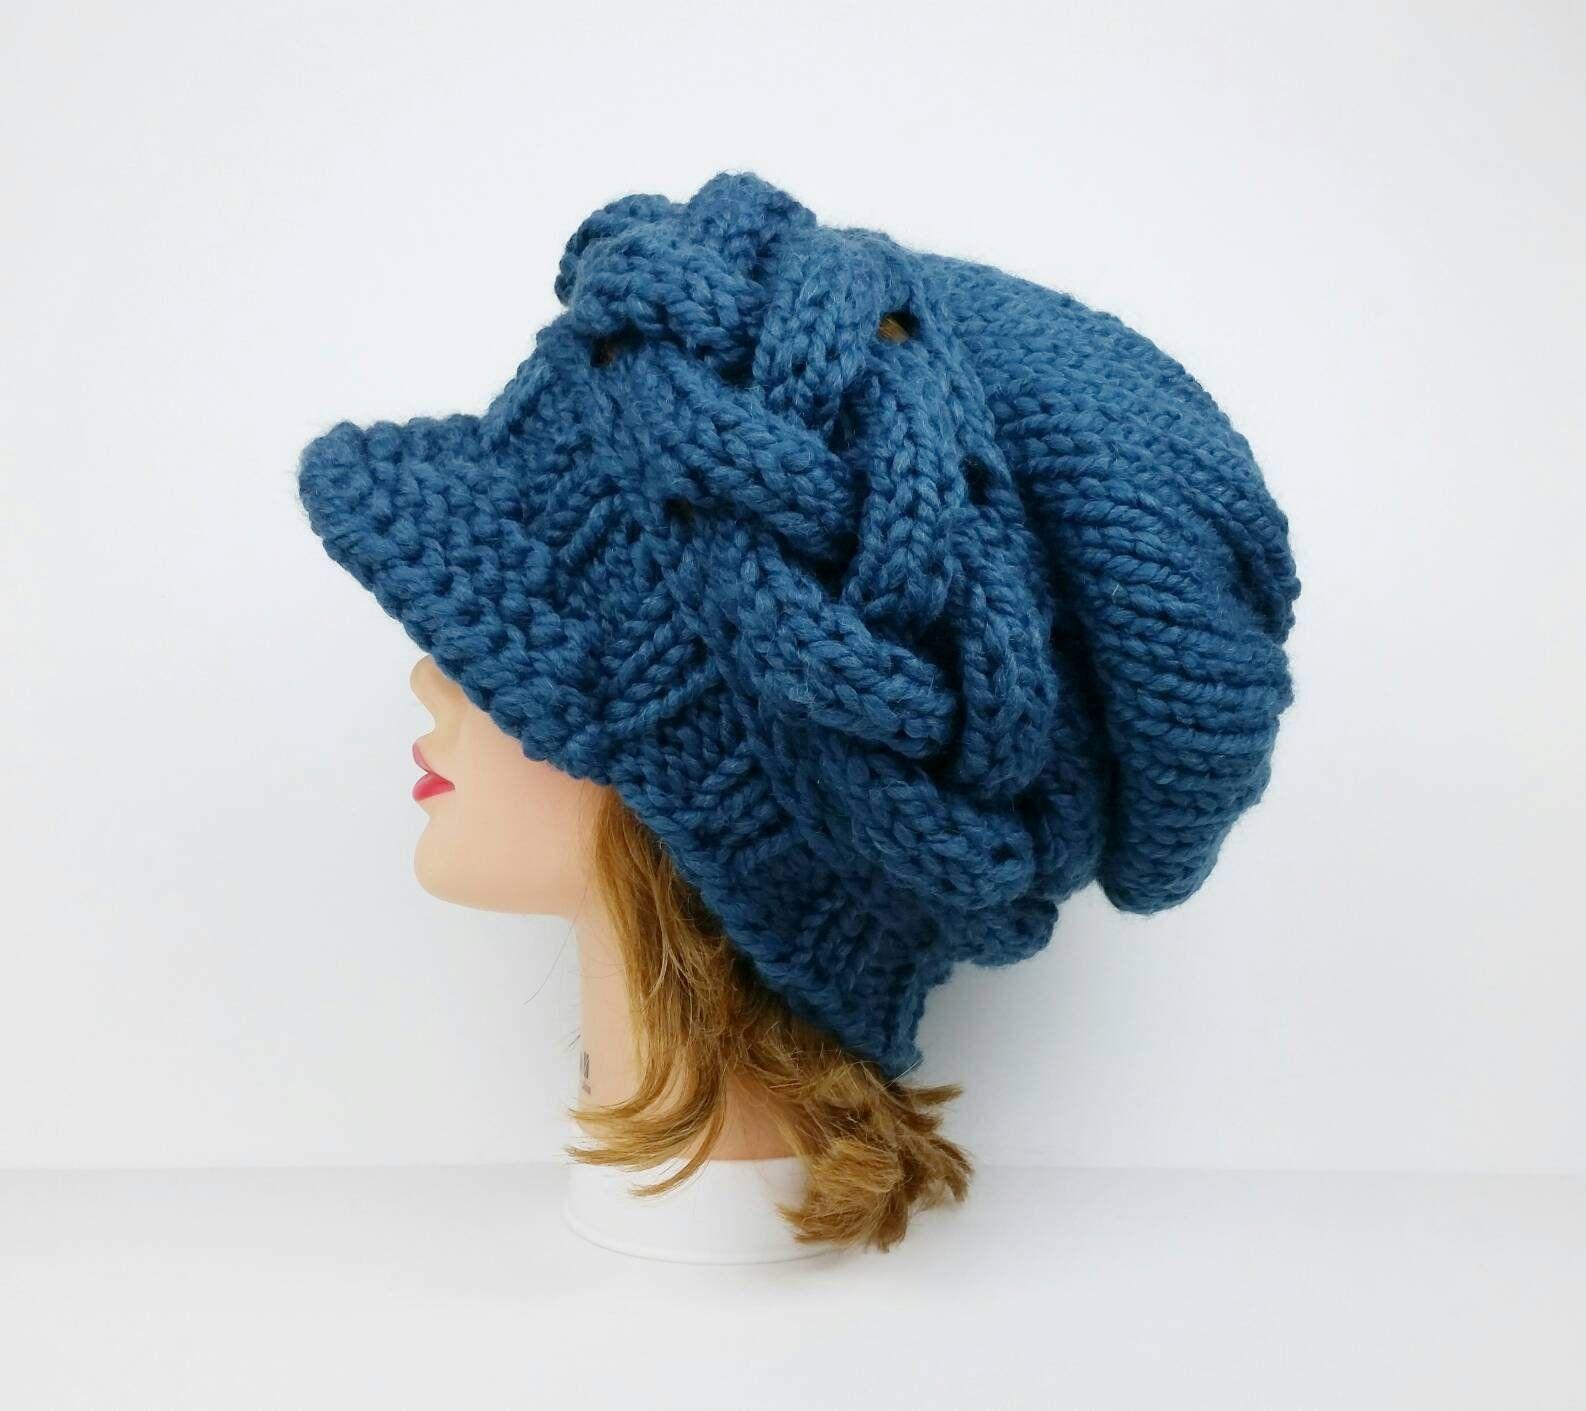 b42926a738d Knit Newsboy Cap